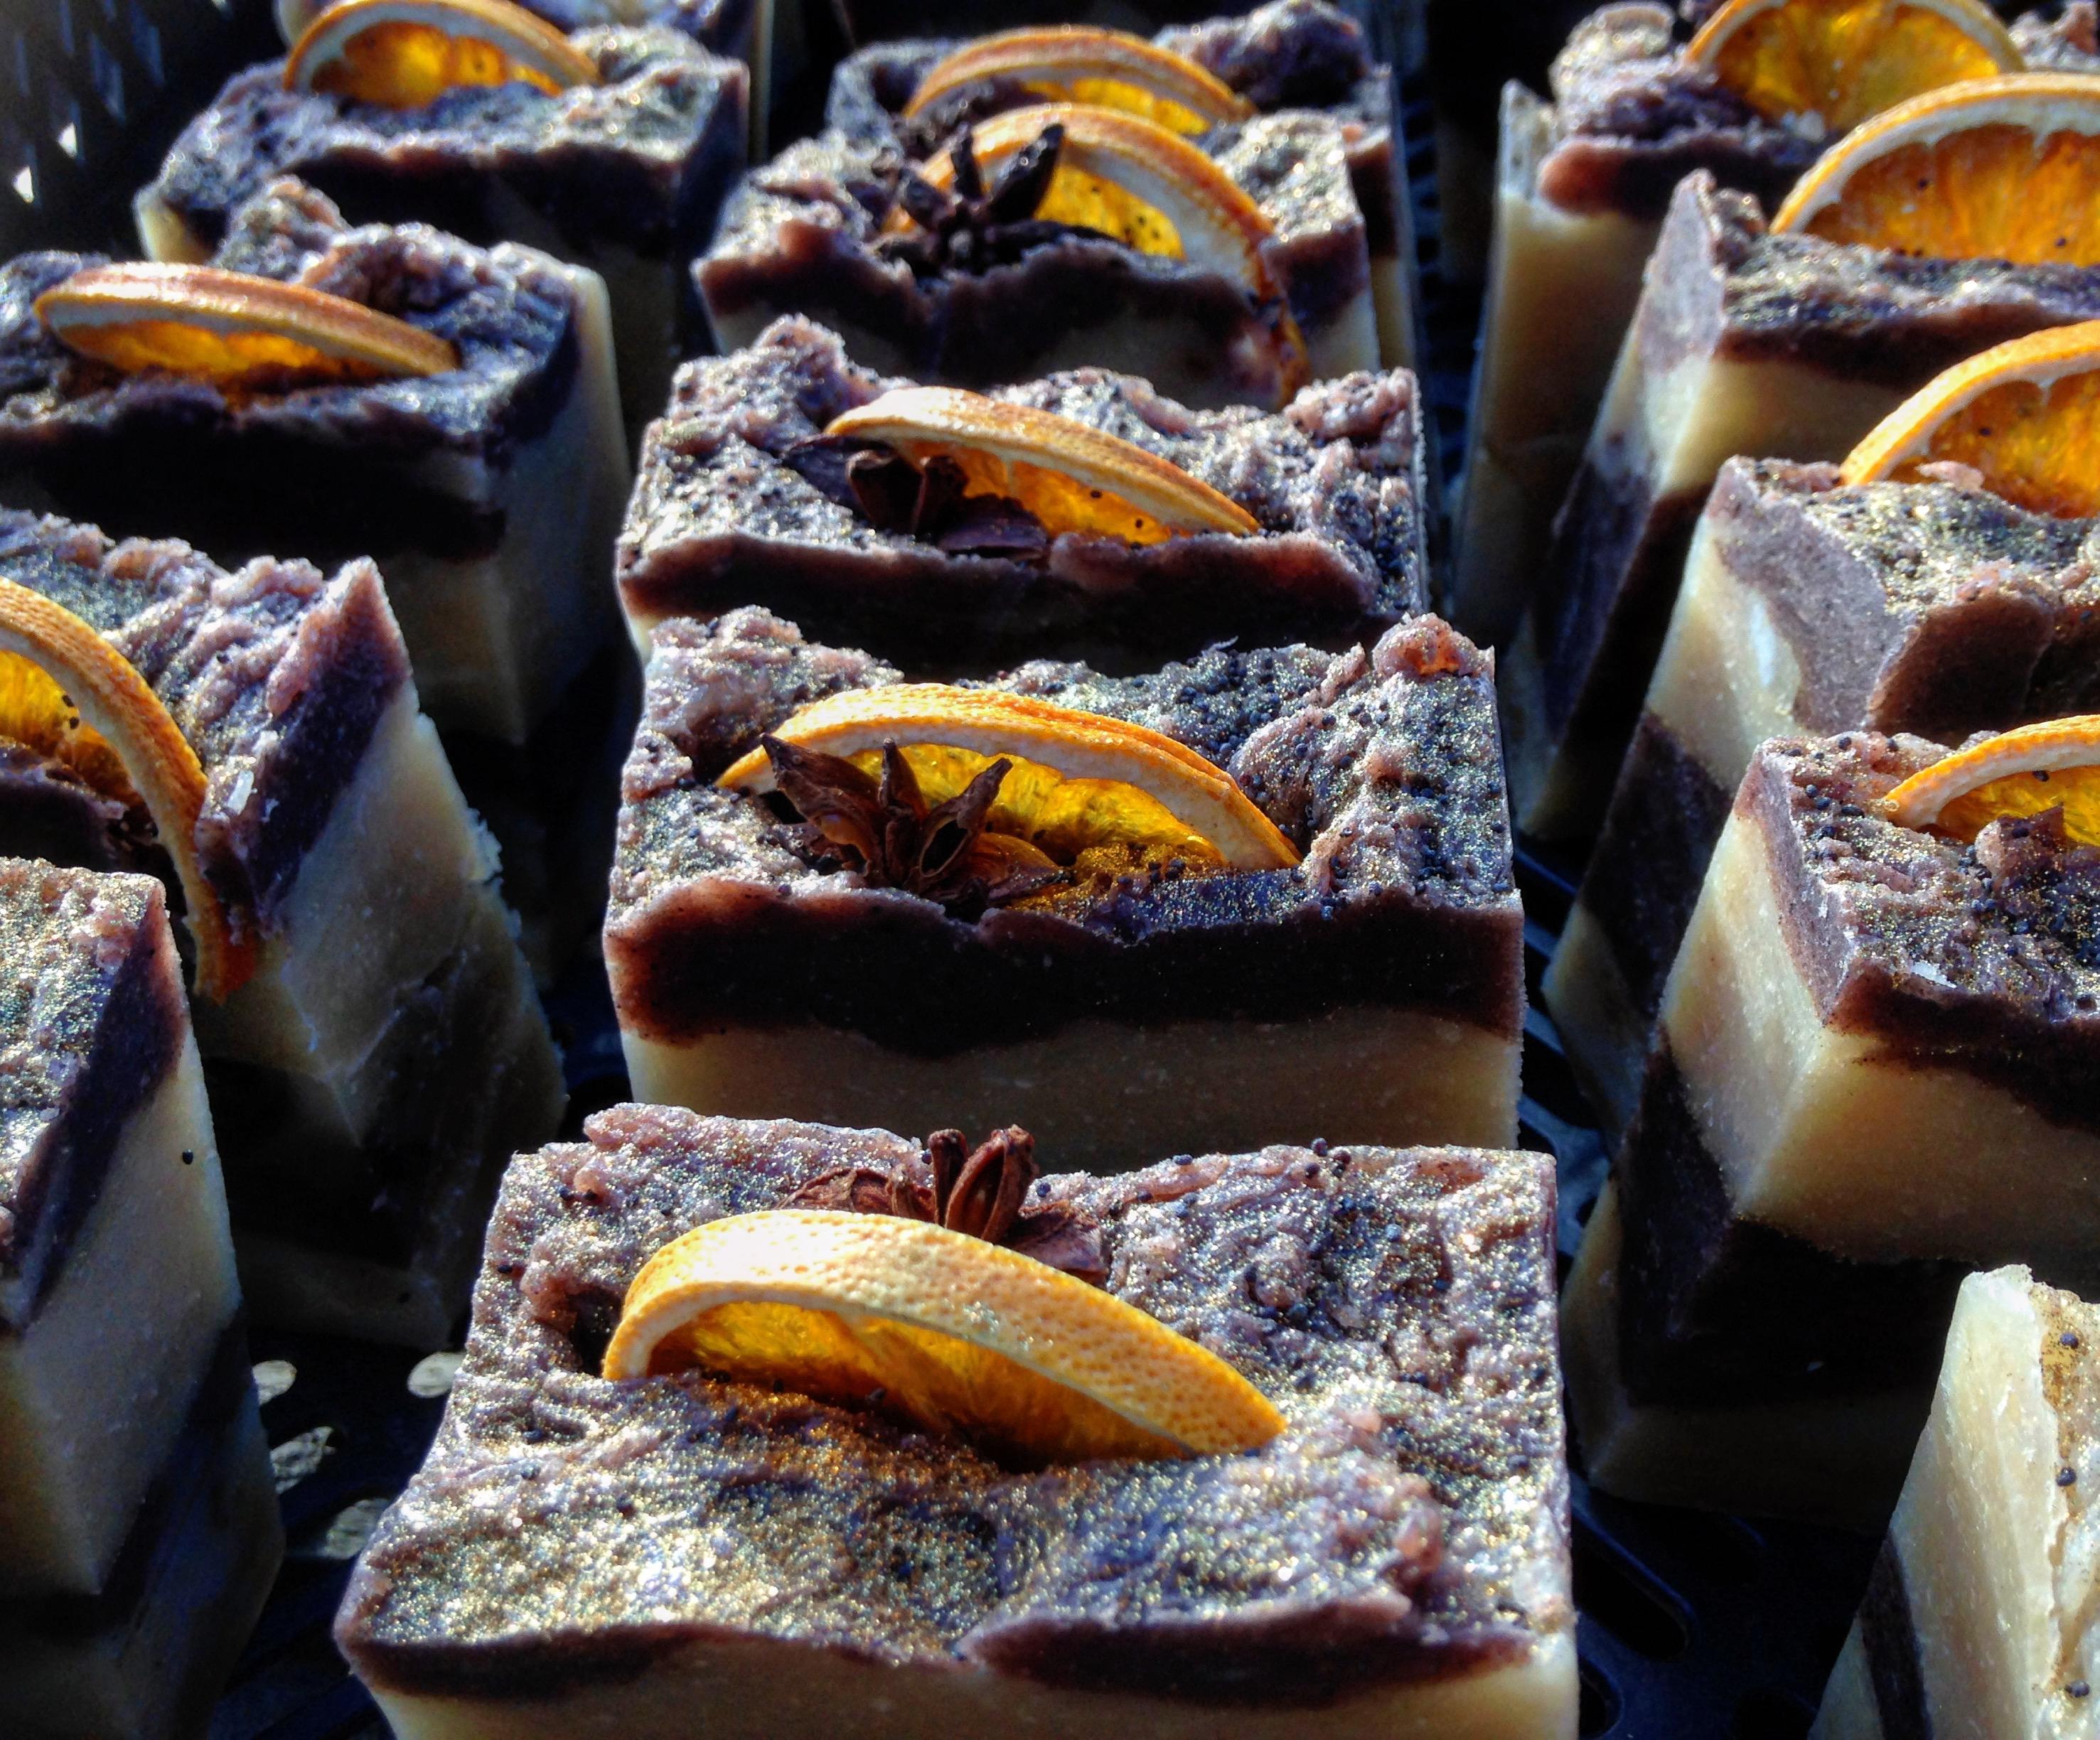 Cinnamon and Chocolate Orange Bar